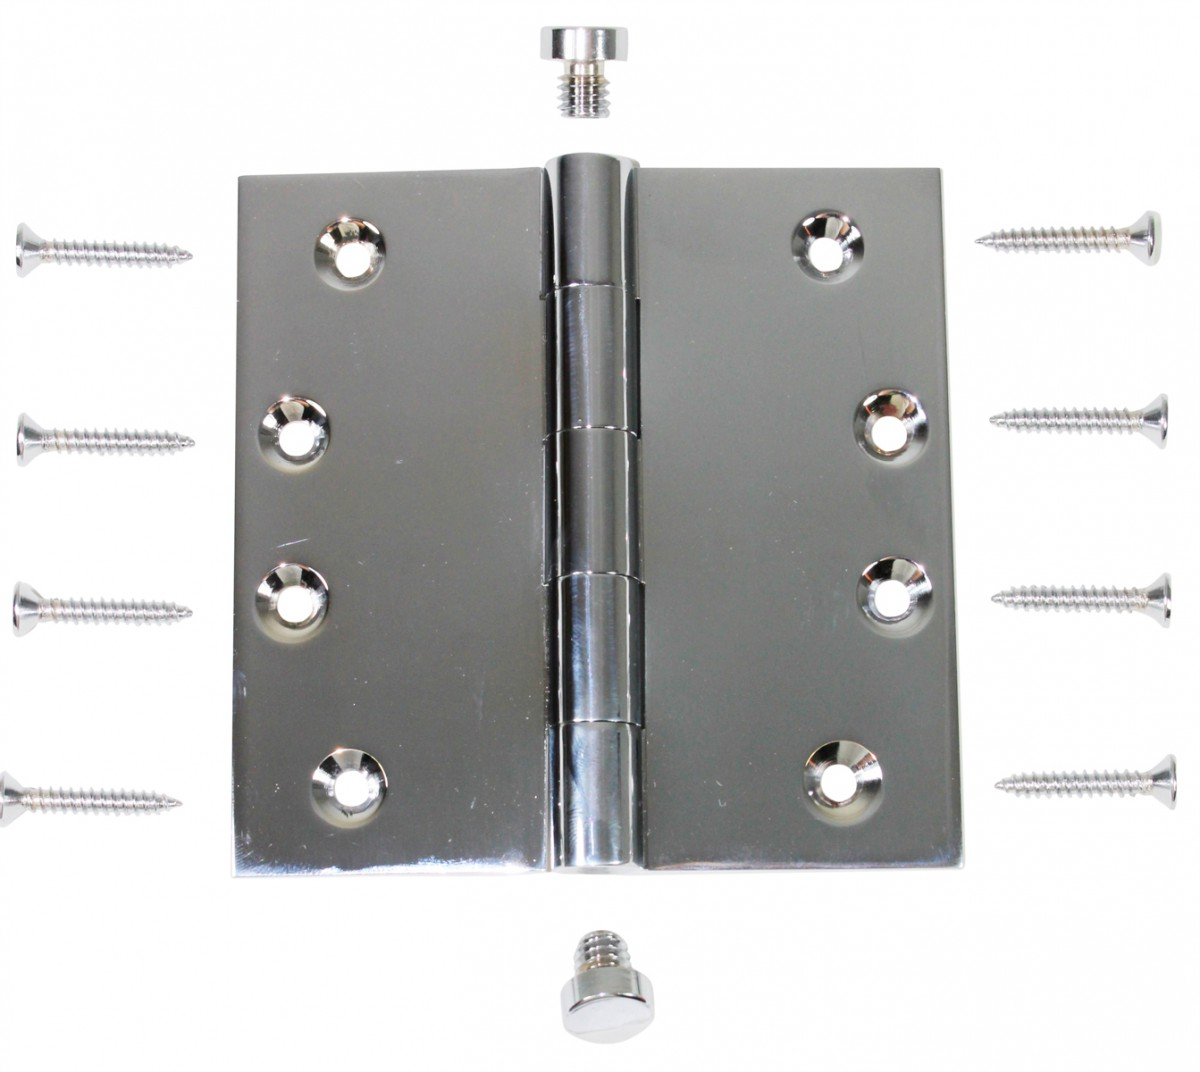 Chrome Solid Brass Cabinet Hinge Coin Tip 4 Door Hinges Door Hinge Solid Brass Hinge